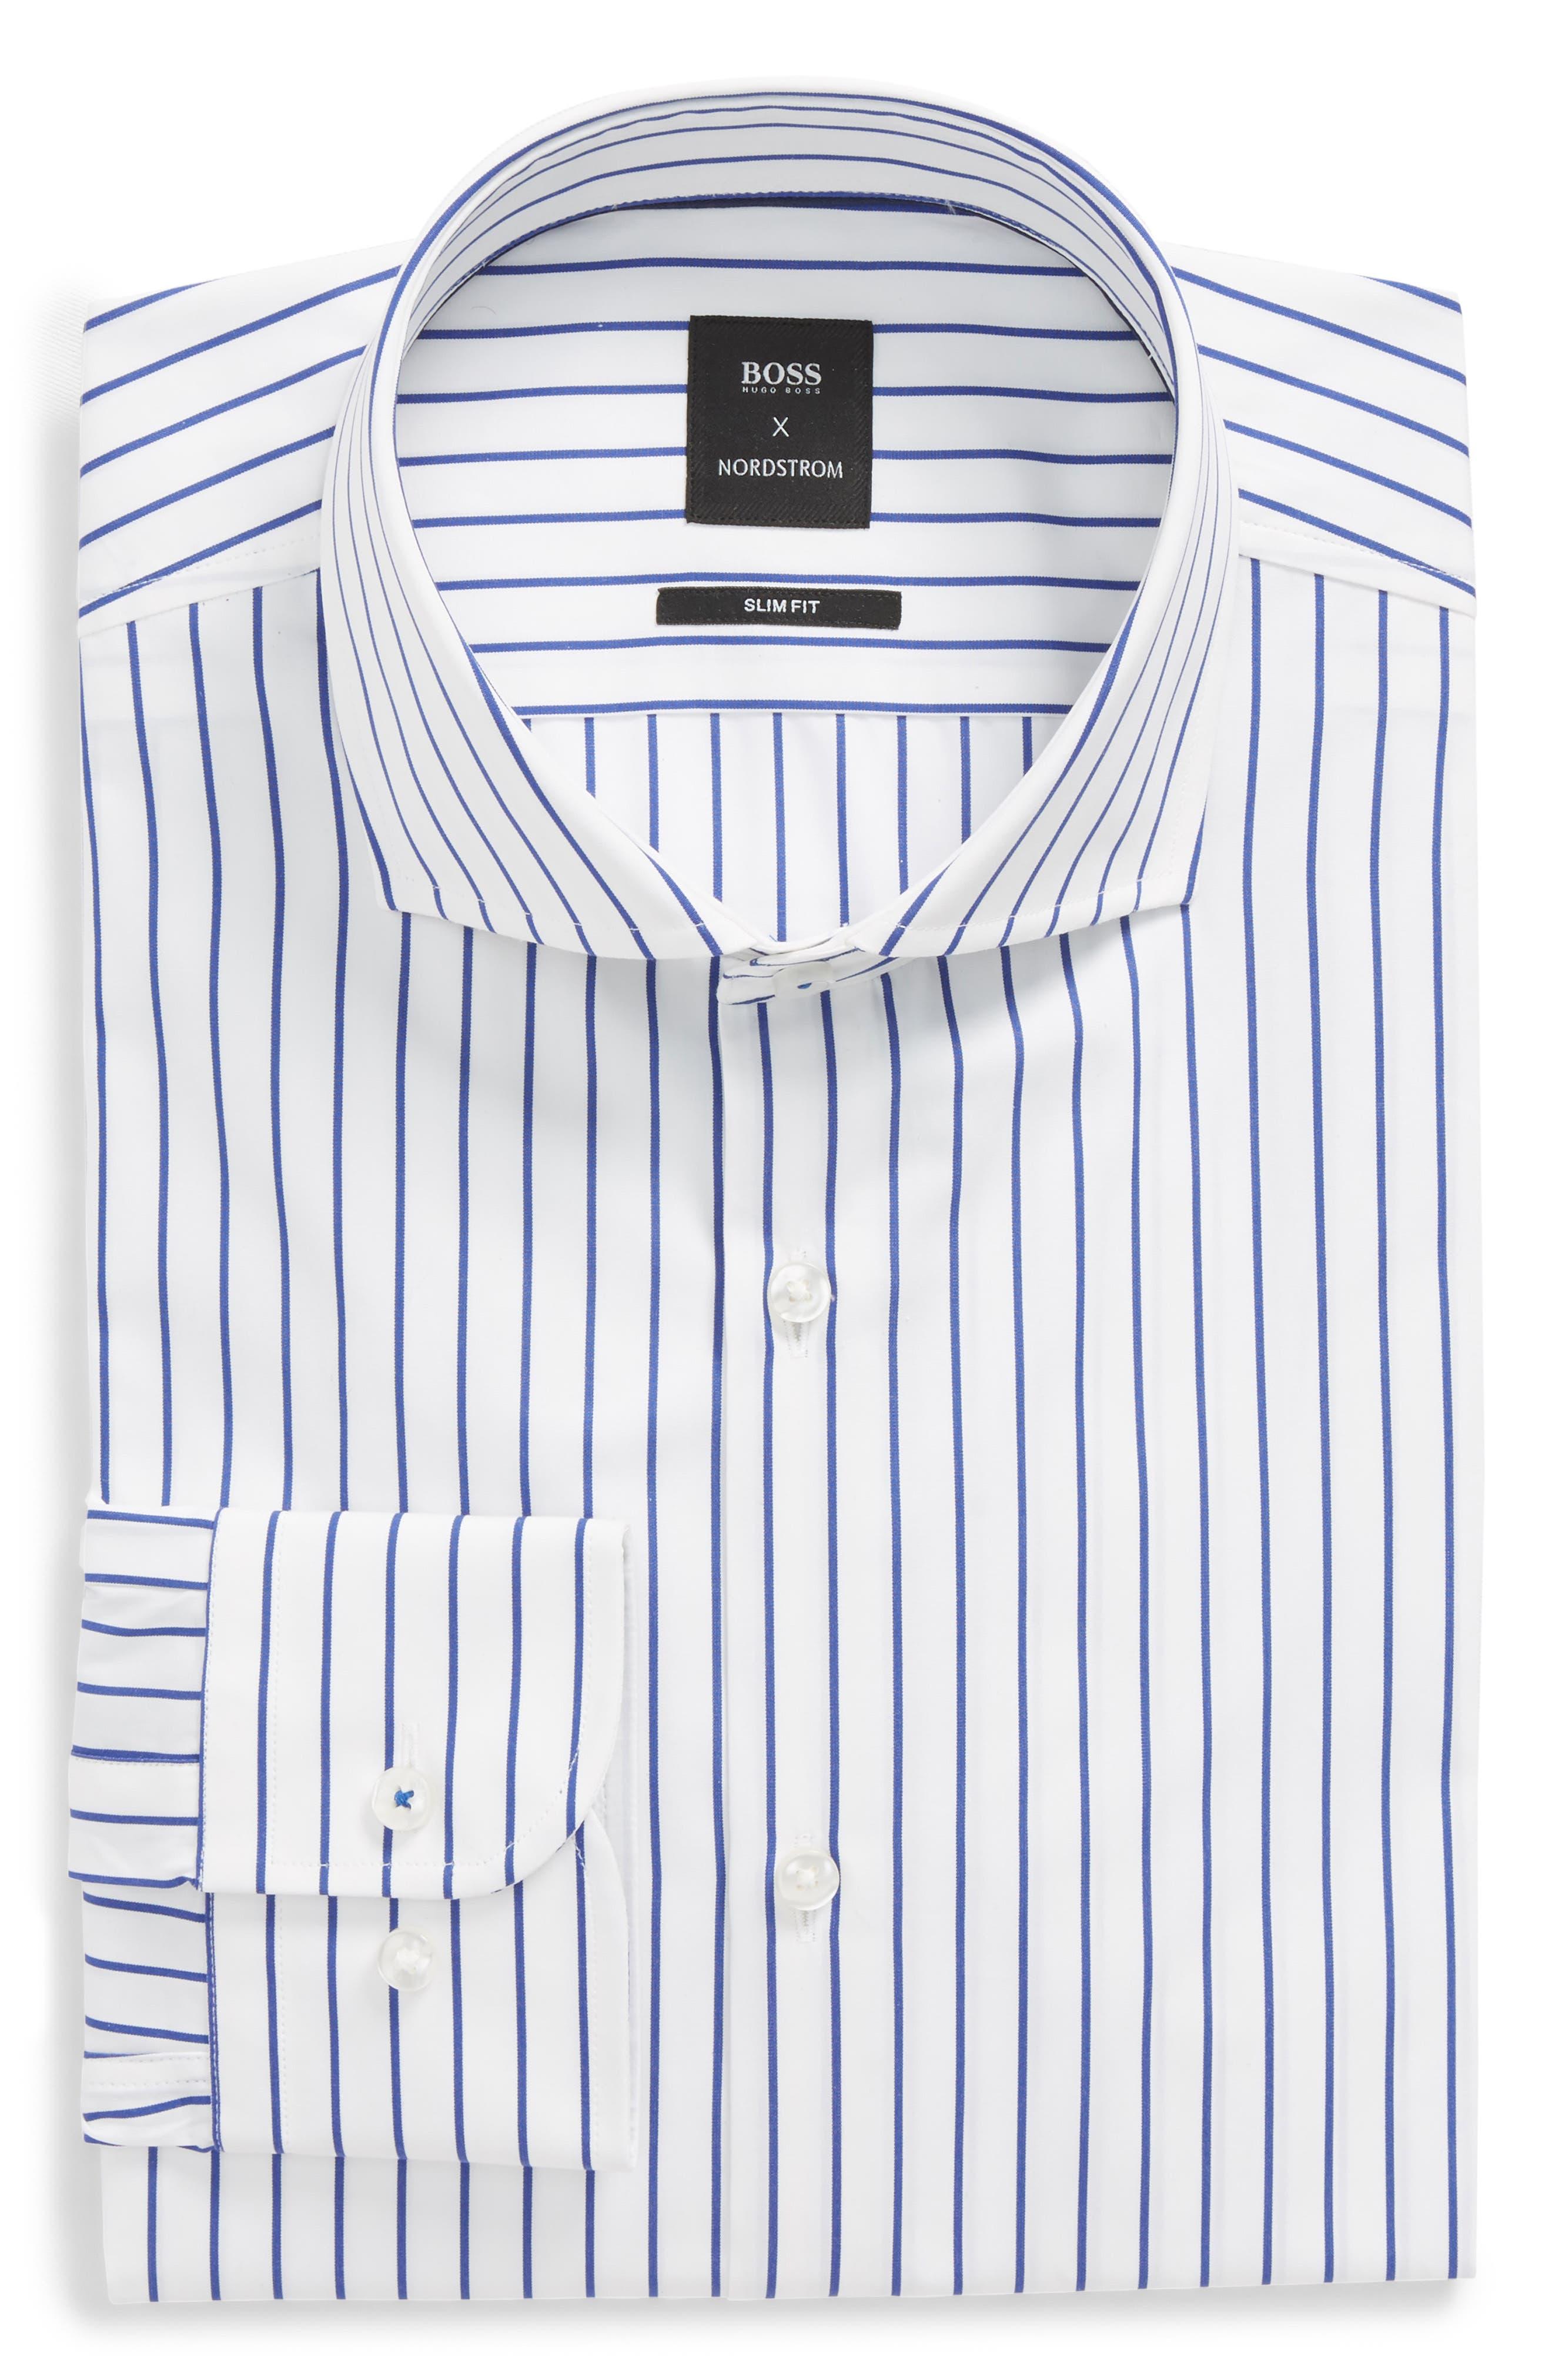 Nordstrom x BOSS Jerrin Slim Fit Stripe Dress Shirt,                         Main,                         color, 429